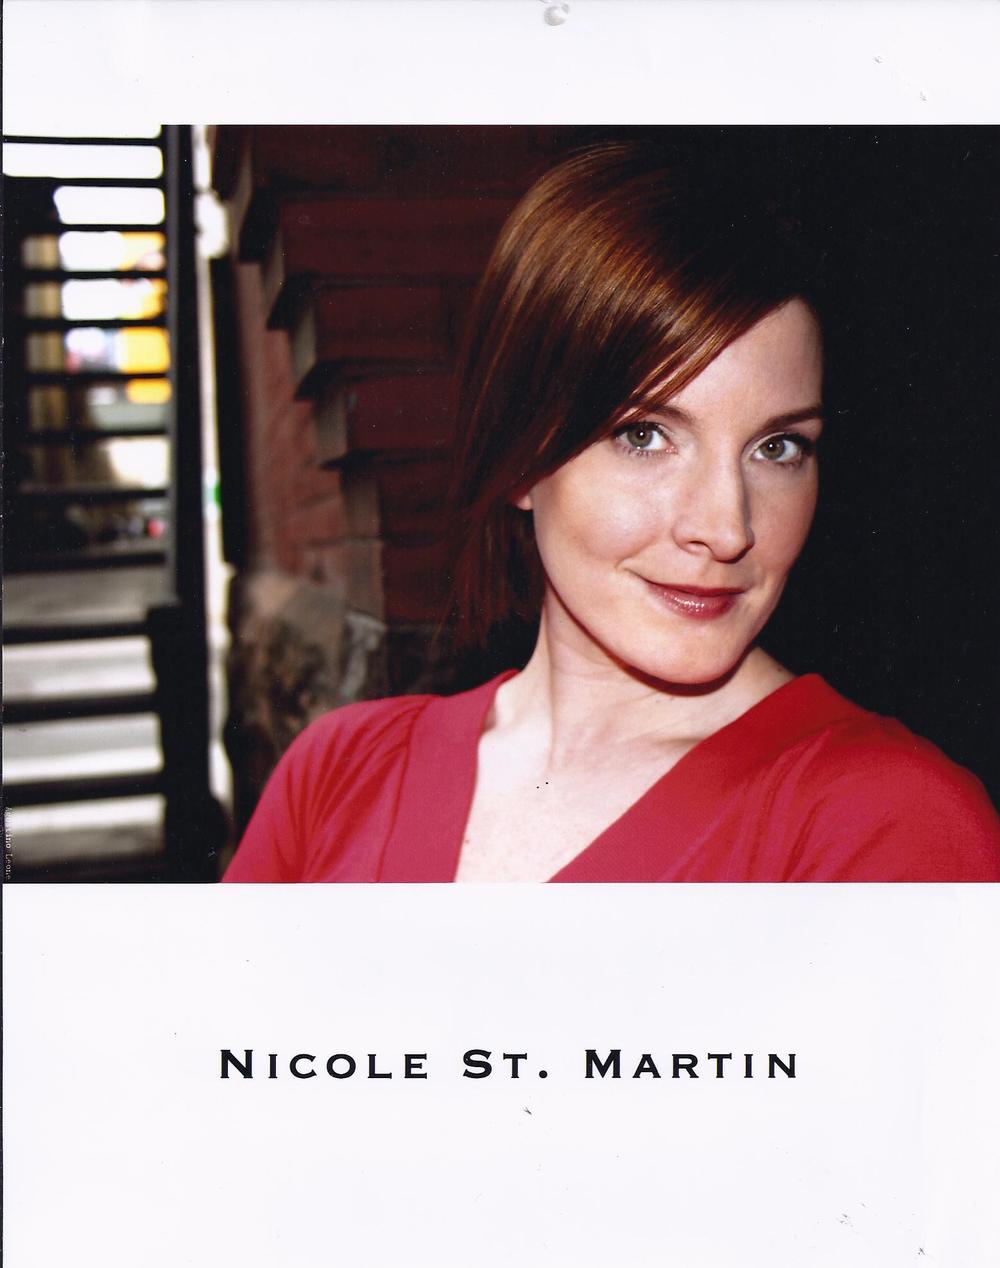 Nicole St. Martin